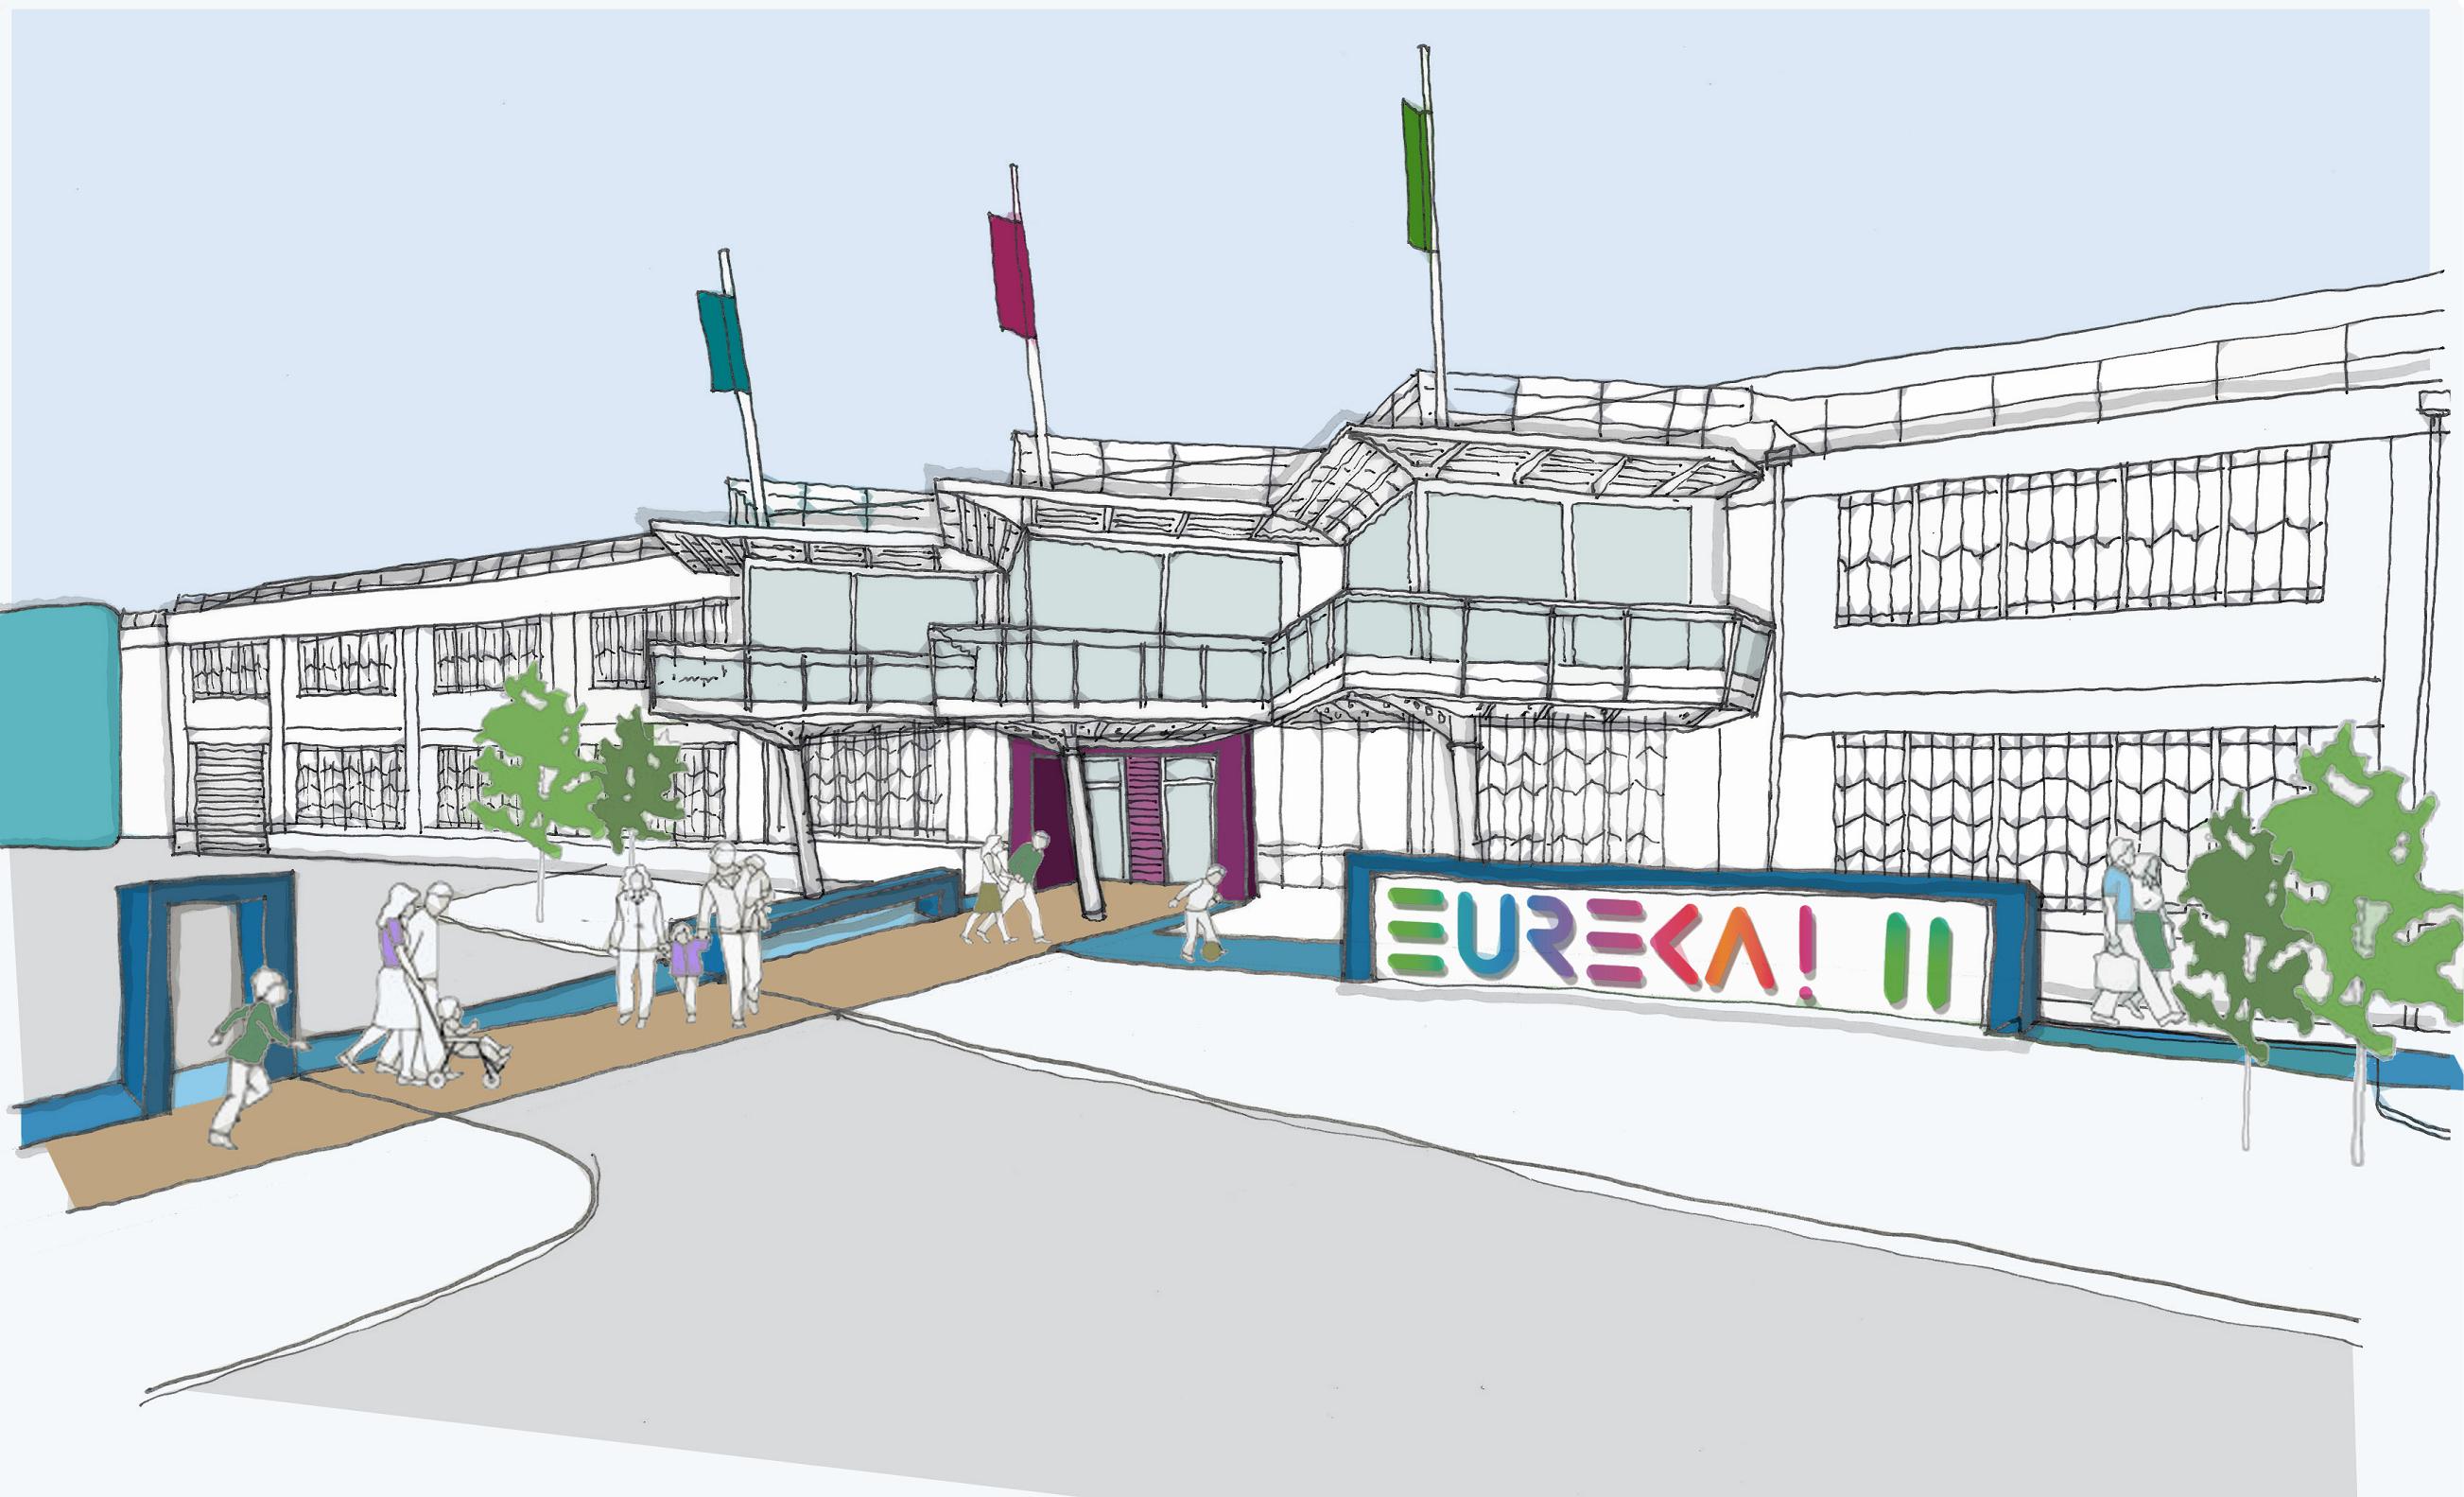 Eureka! Merseyside Concept drawing. Credits: Eureka!